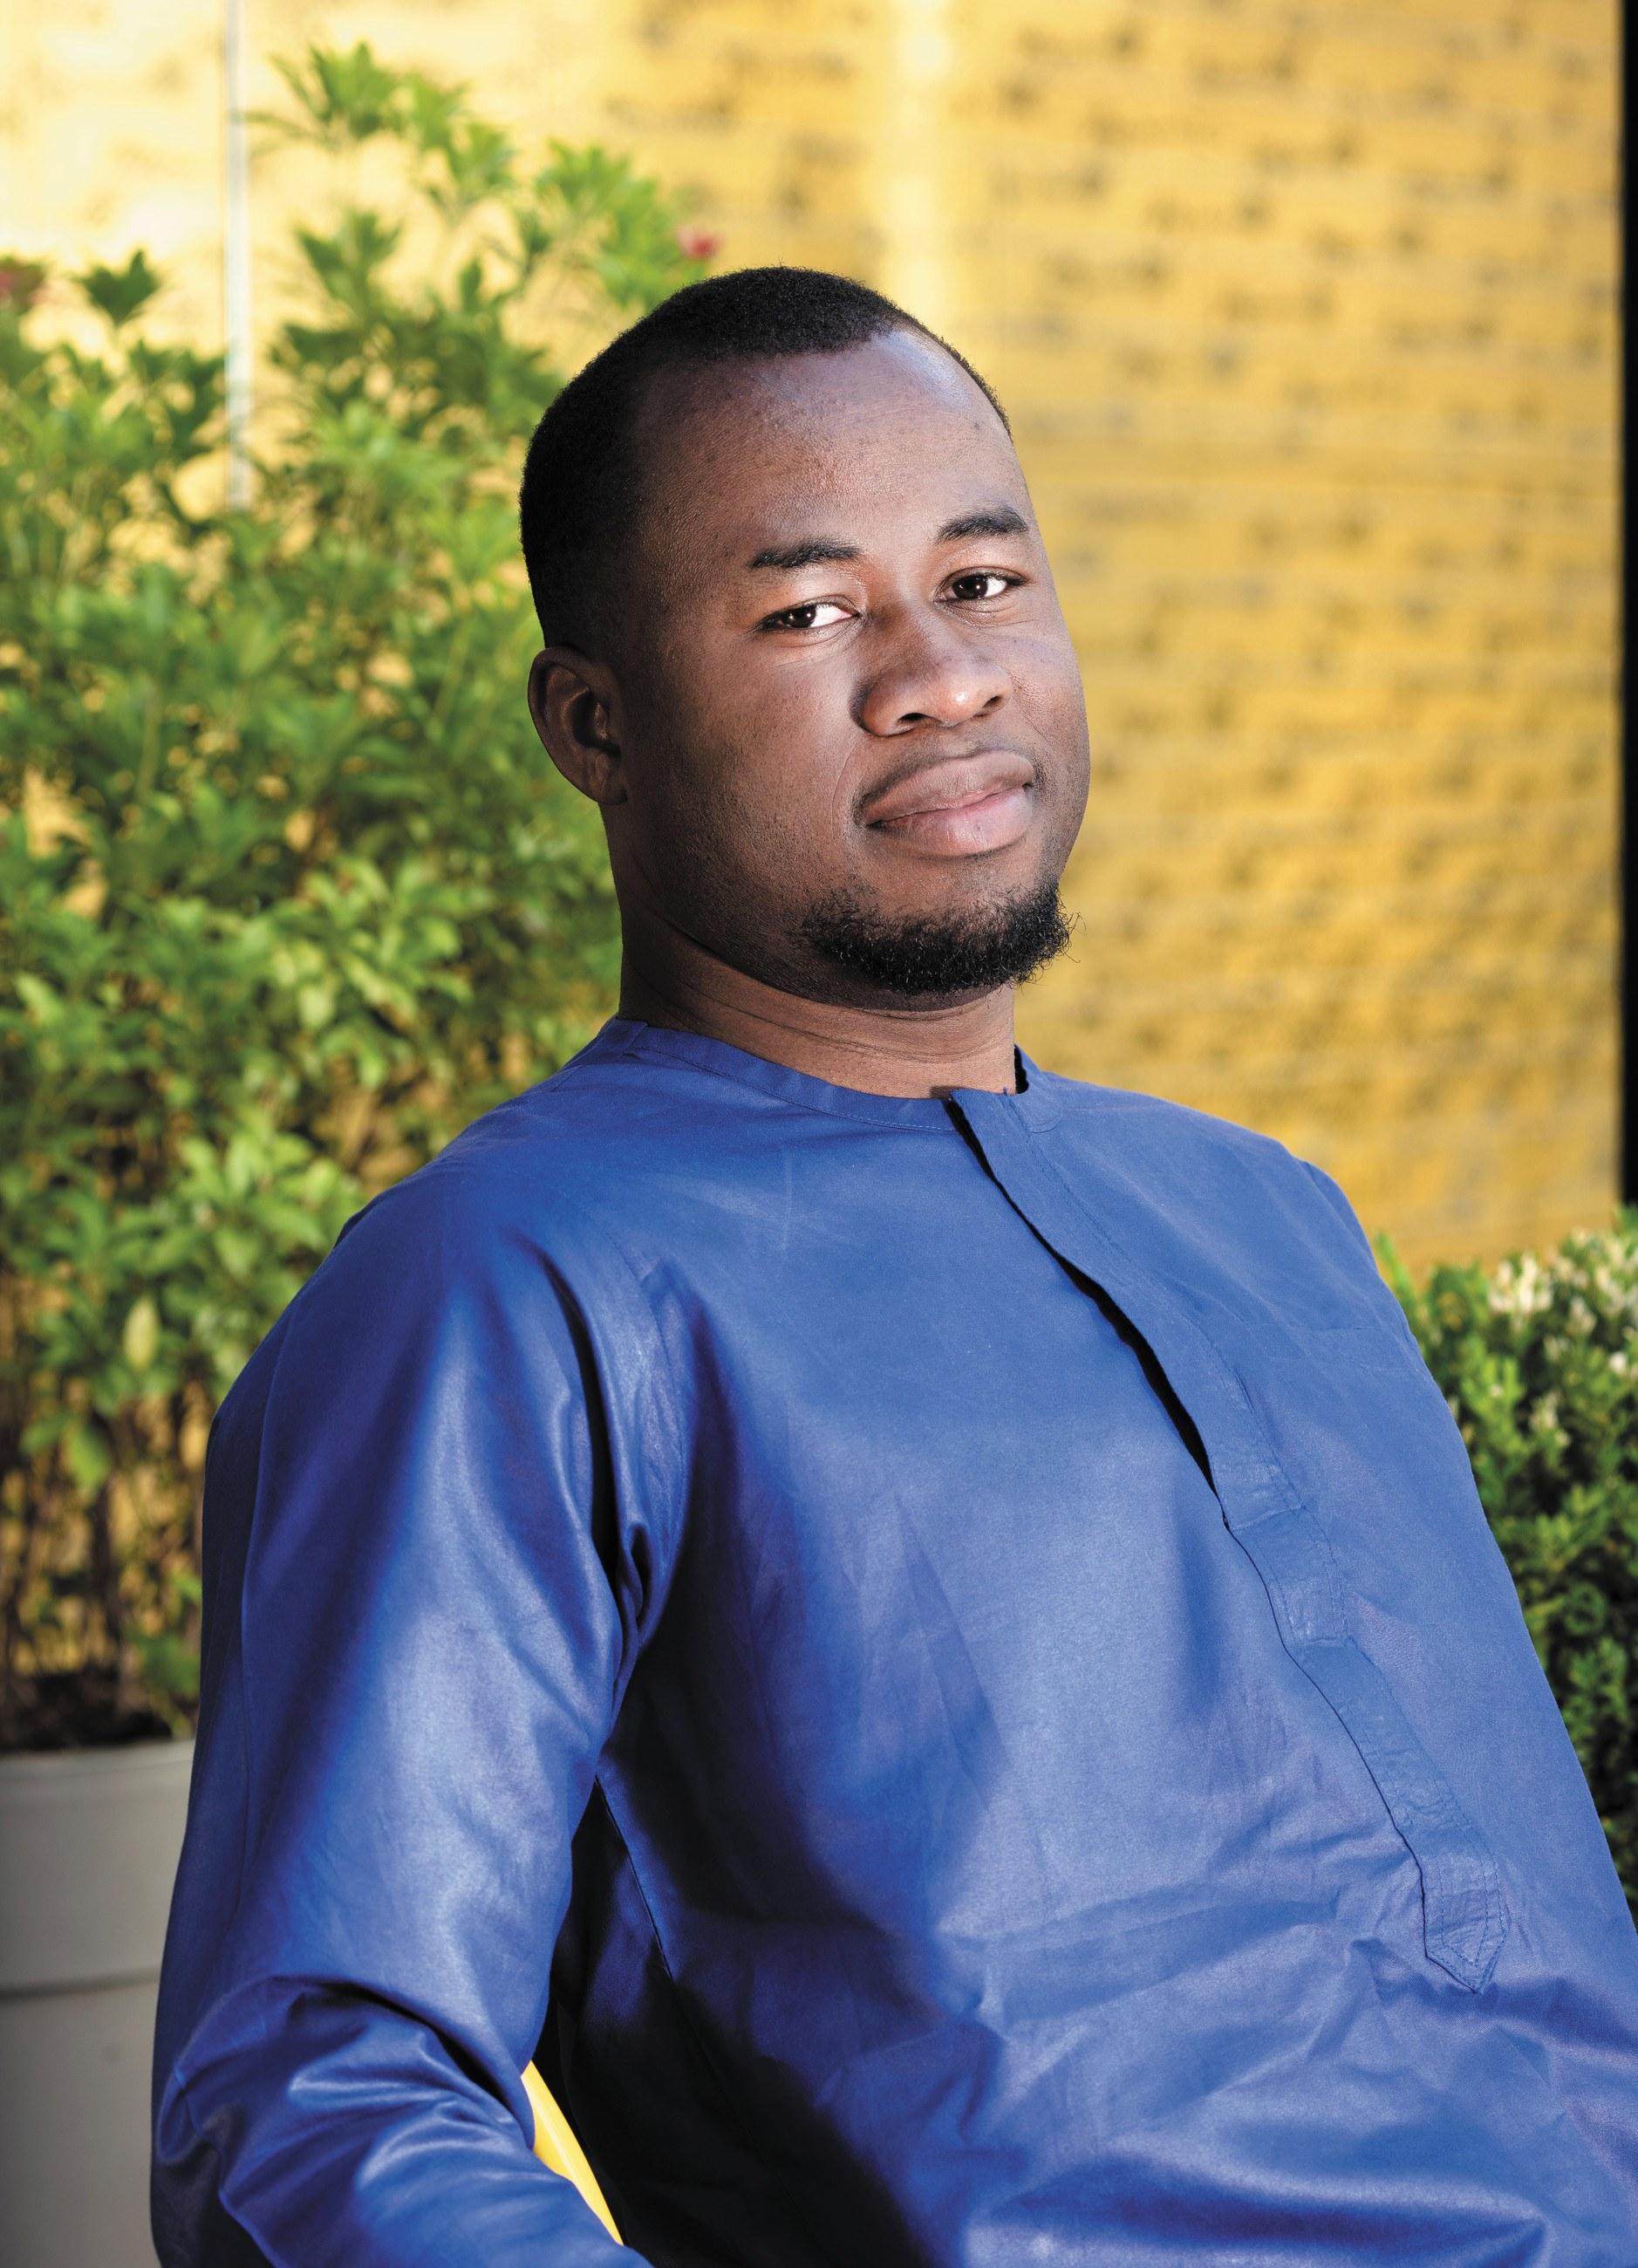 Chigozie Obioma, credit Jason Keith